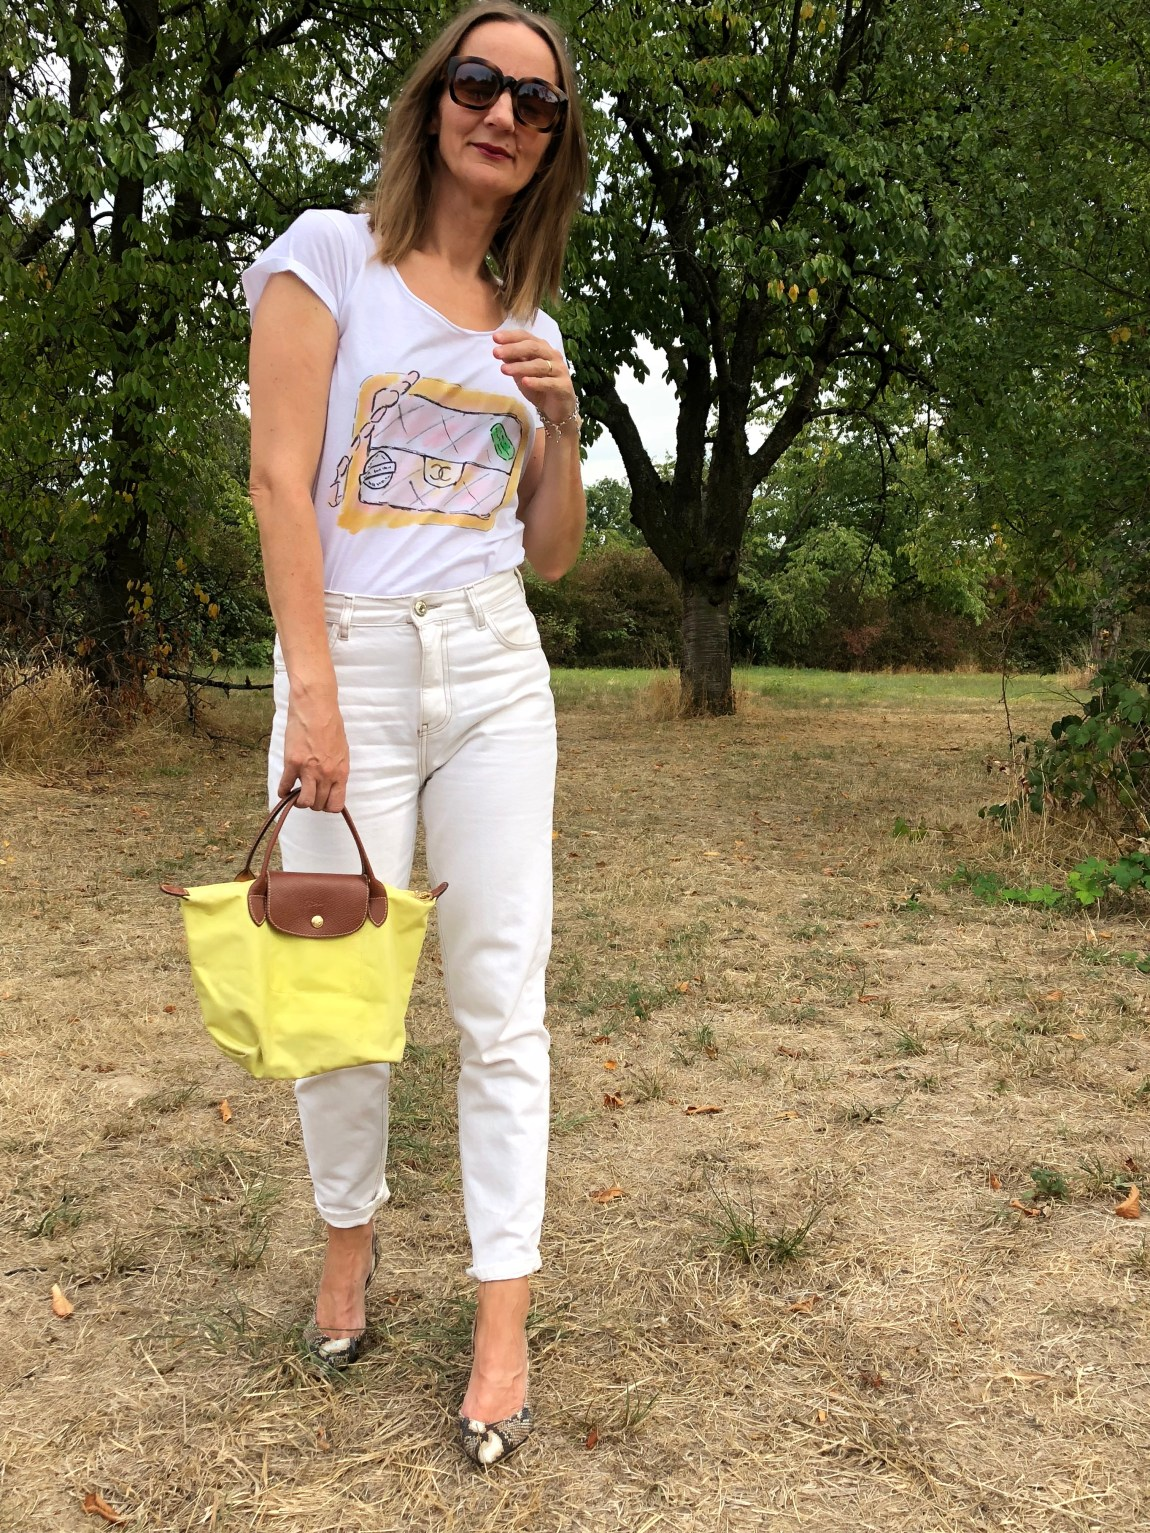 geburtstagsoutfit_denim_weisse-jeans_pumps_pythonprint_neon-tasche_longchamp_chanel_mode-blog-frankfurt_oceanblue-style (7)-01